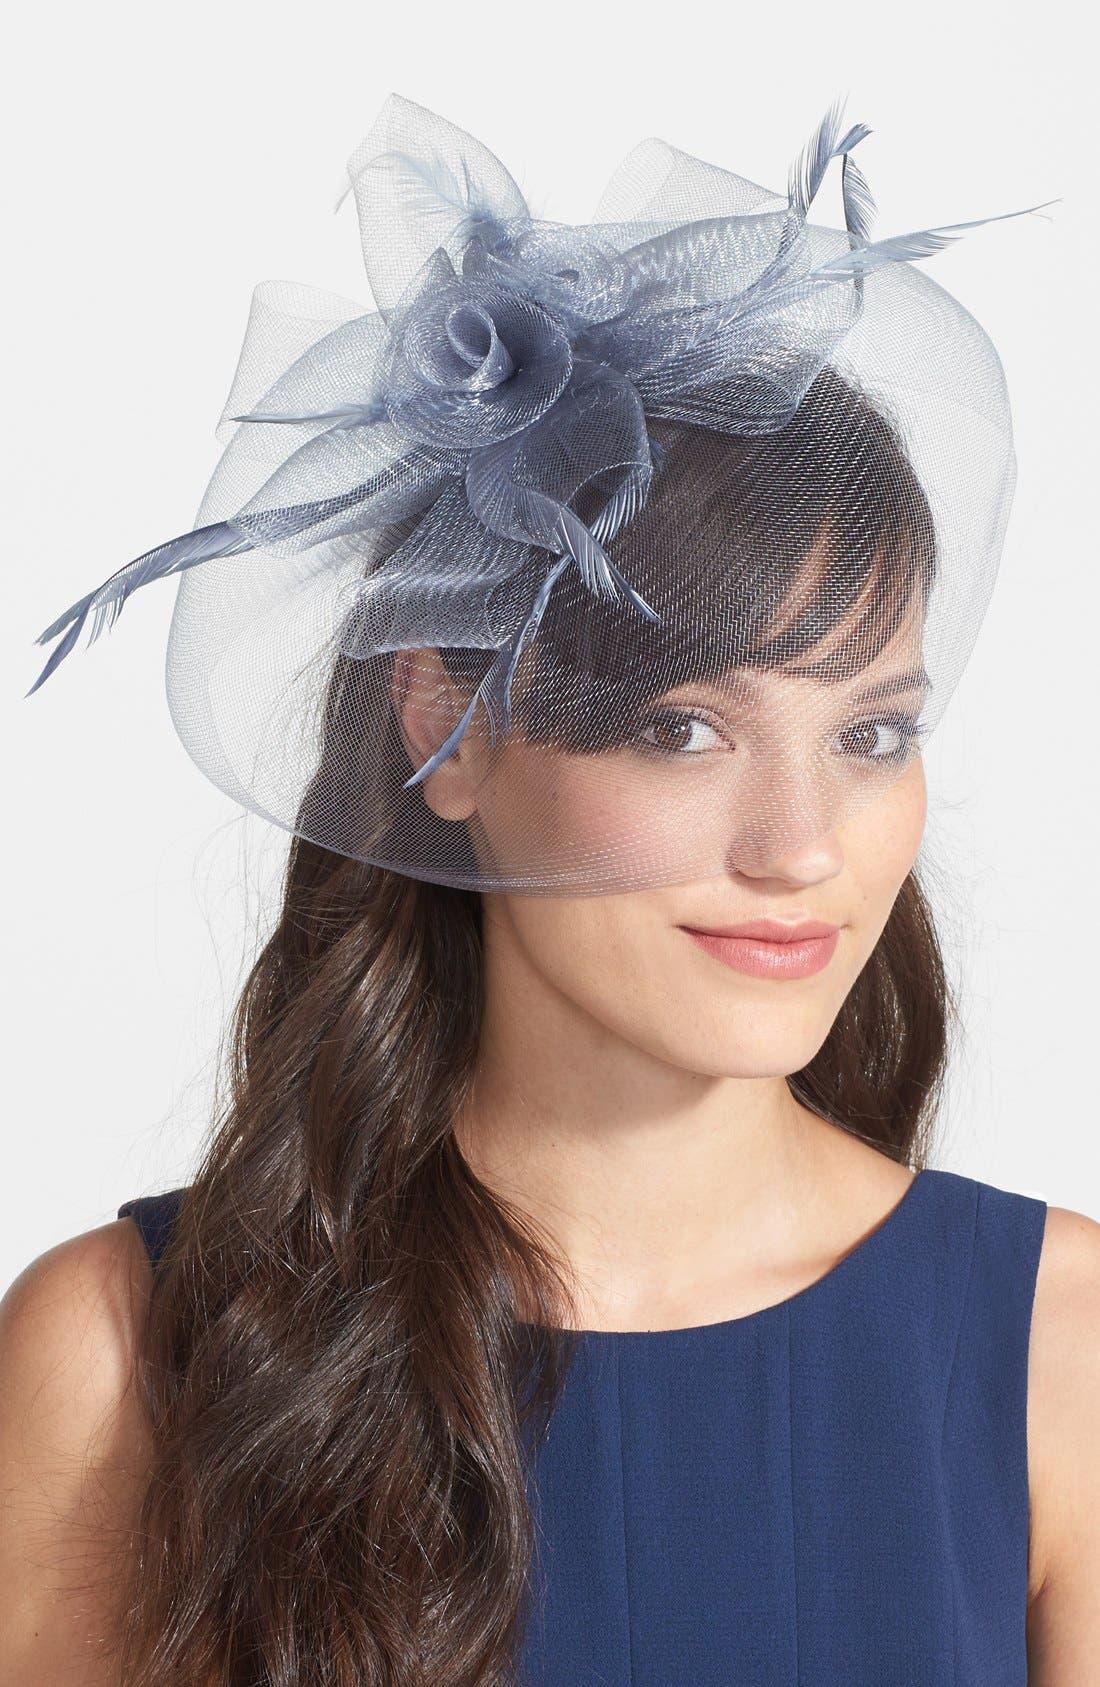 Alternate Image 1 Selected - Tasha 'Flawless and Cautious' Fascinator Headband